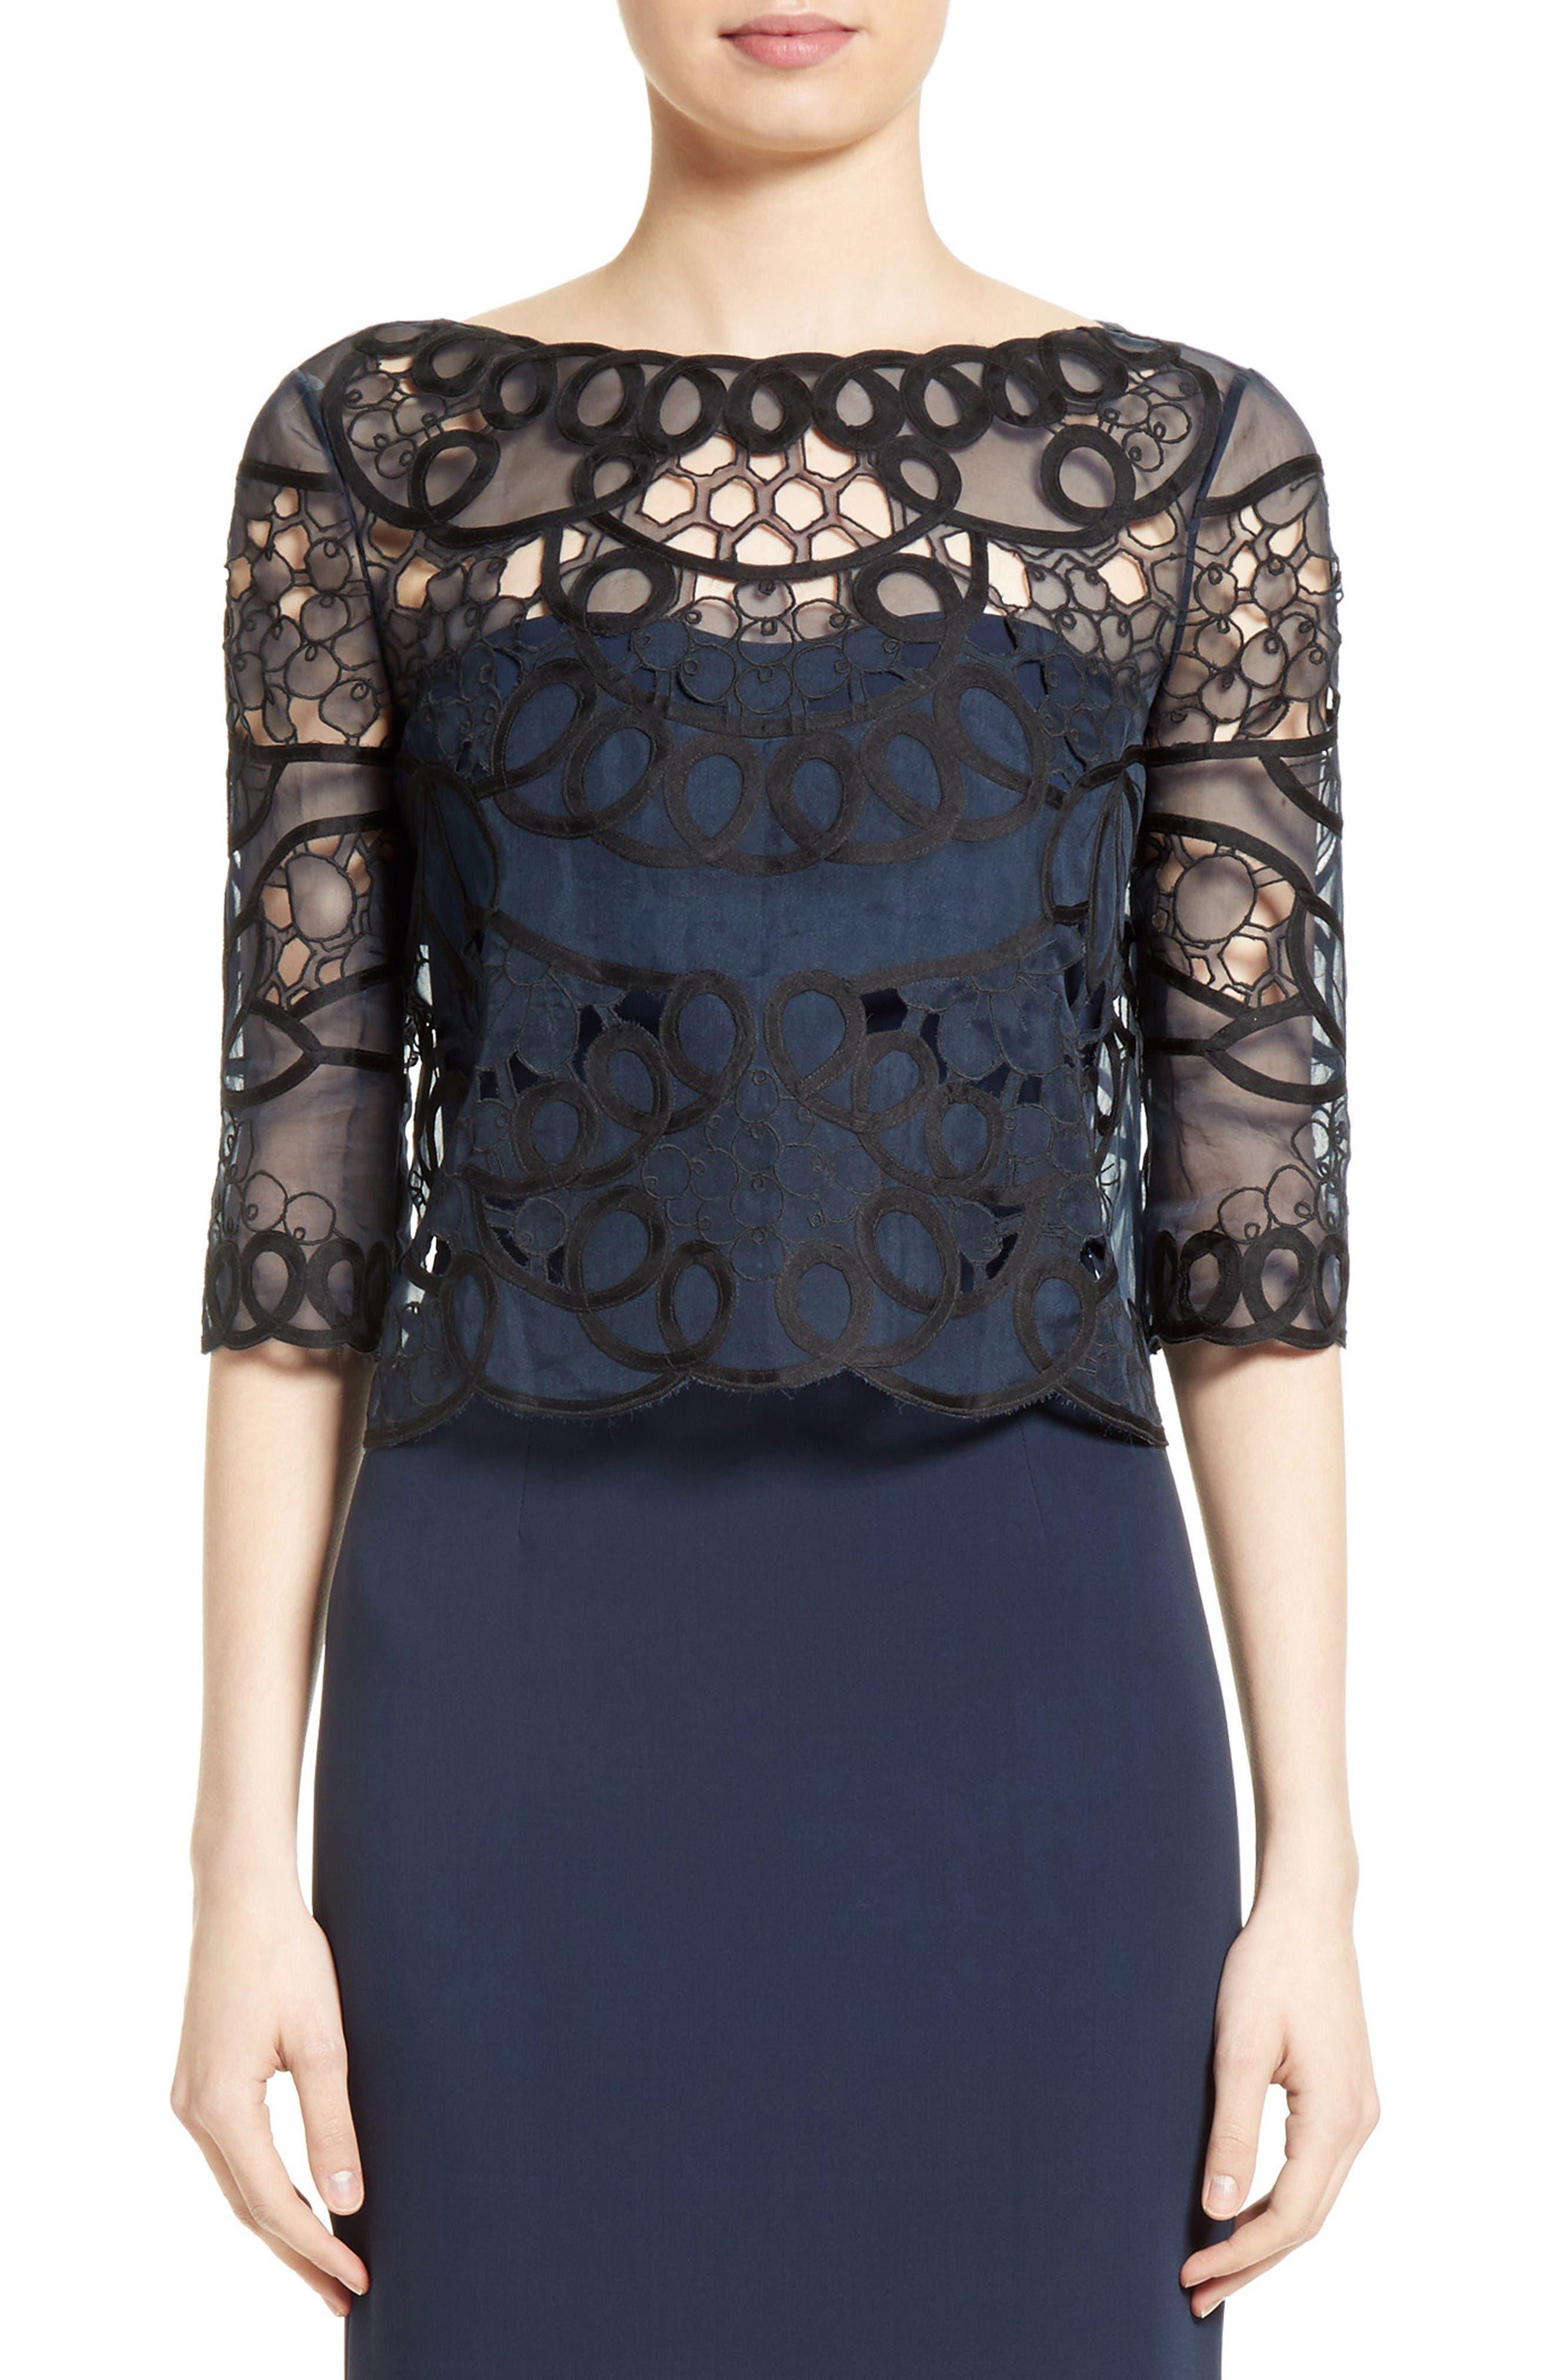 Alternate Image 1 Selected - Carolina Herrera Reversible Lace Bolero